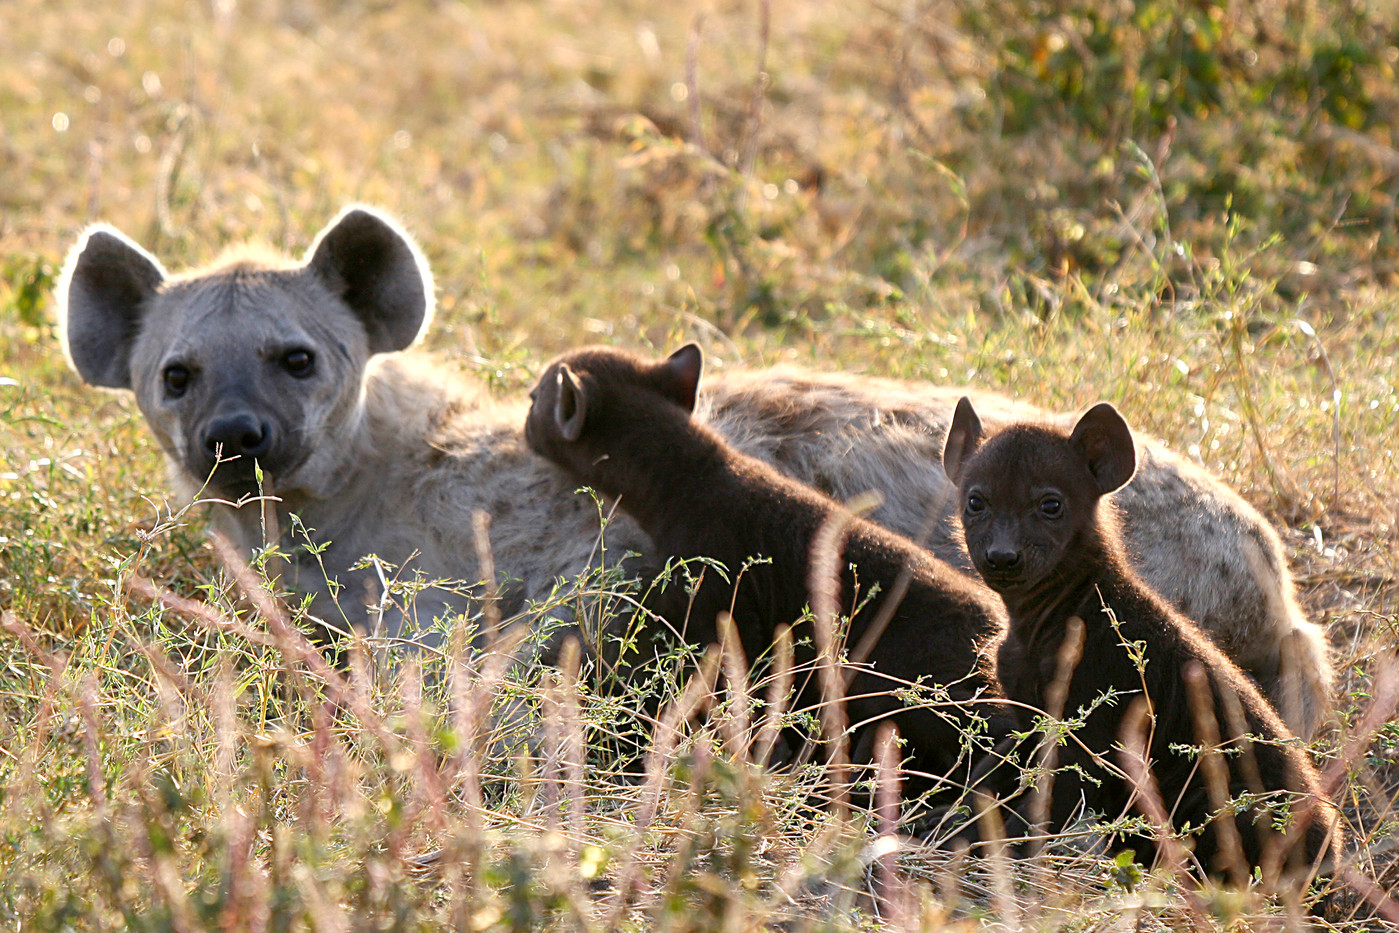 Hyena & pups in the Serengeti NP, Tanzania